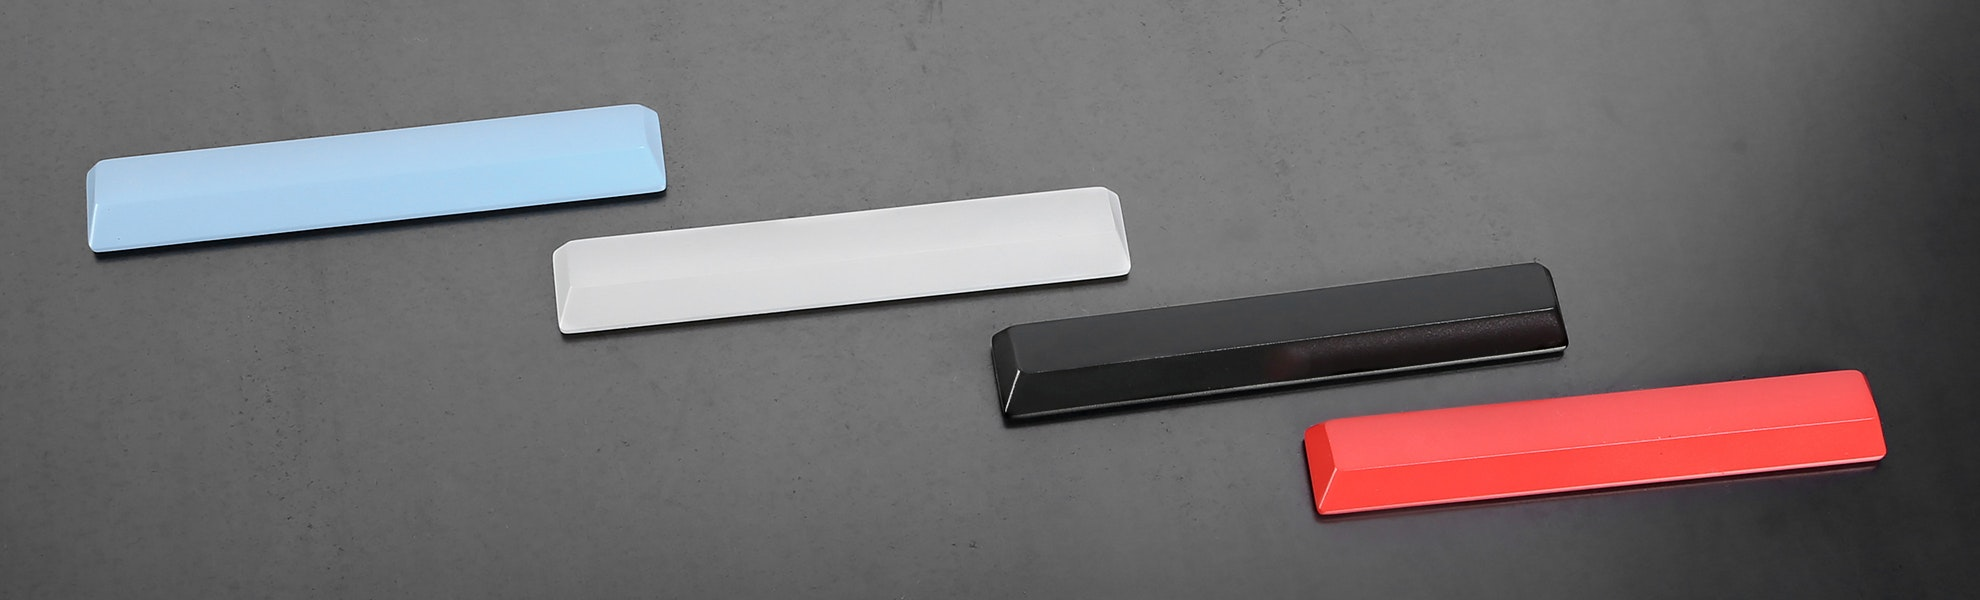 Topre PBT Space Bar (2-Pack)